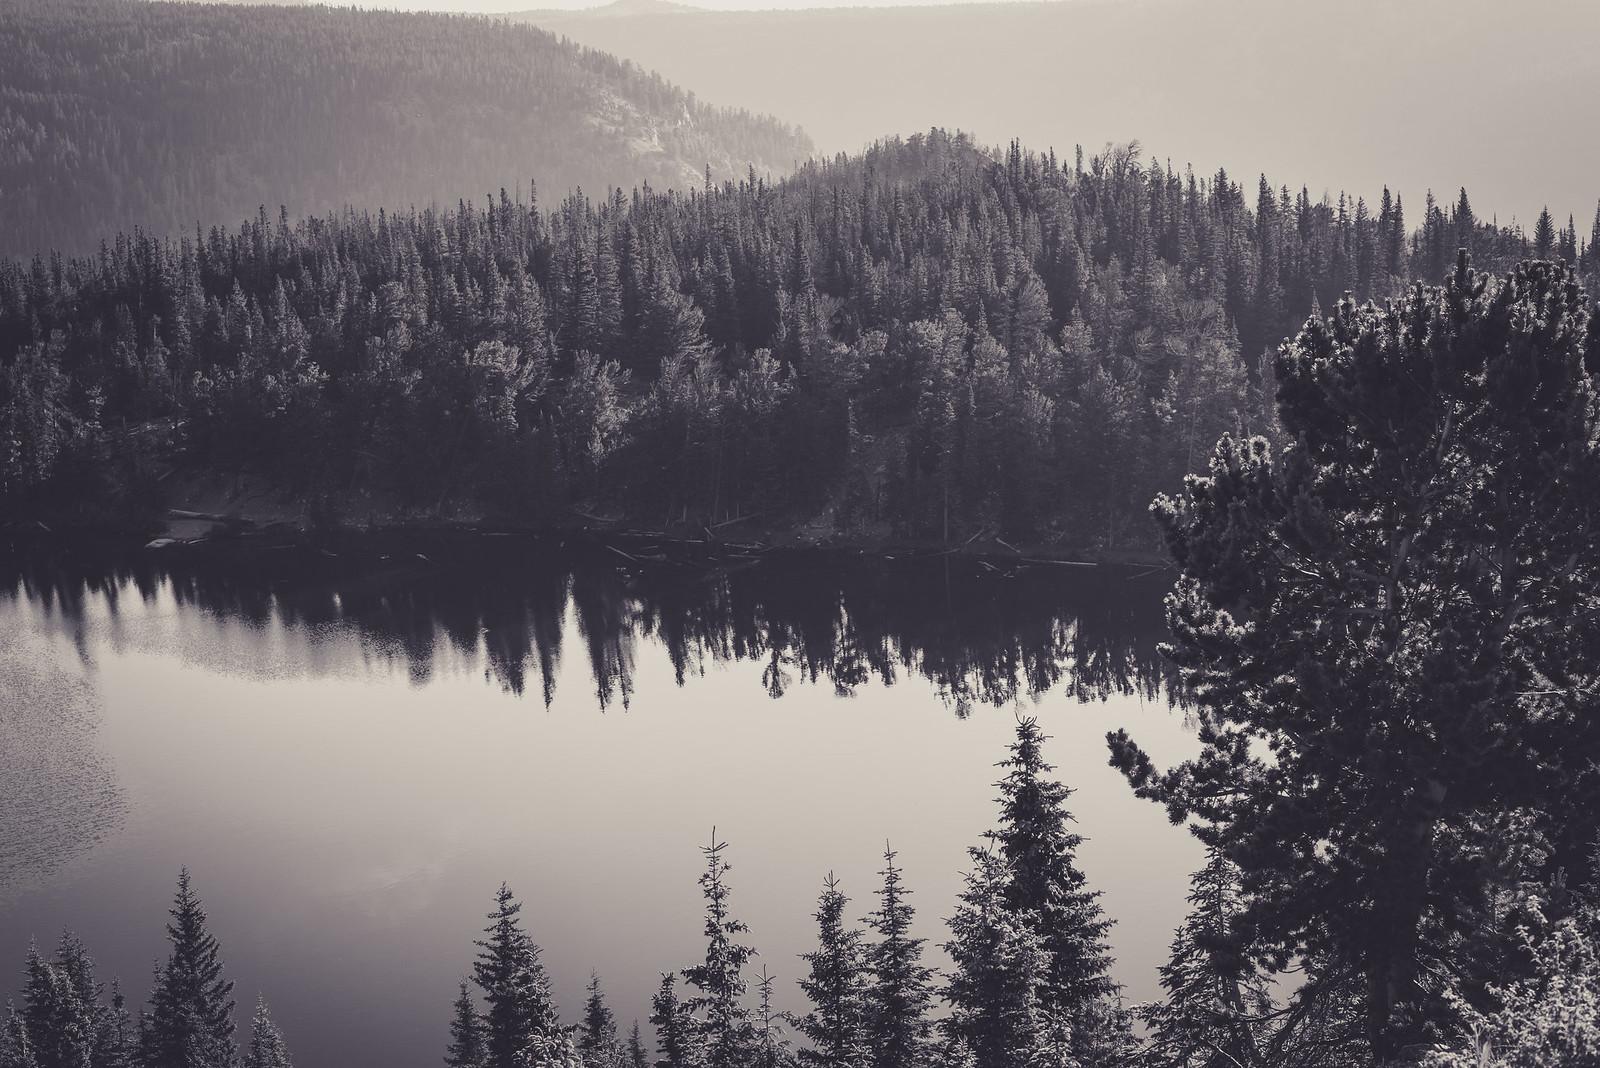 PhotoSwipe: Responsive JavaScript Image Gallery